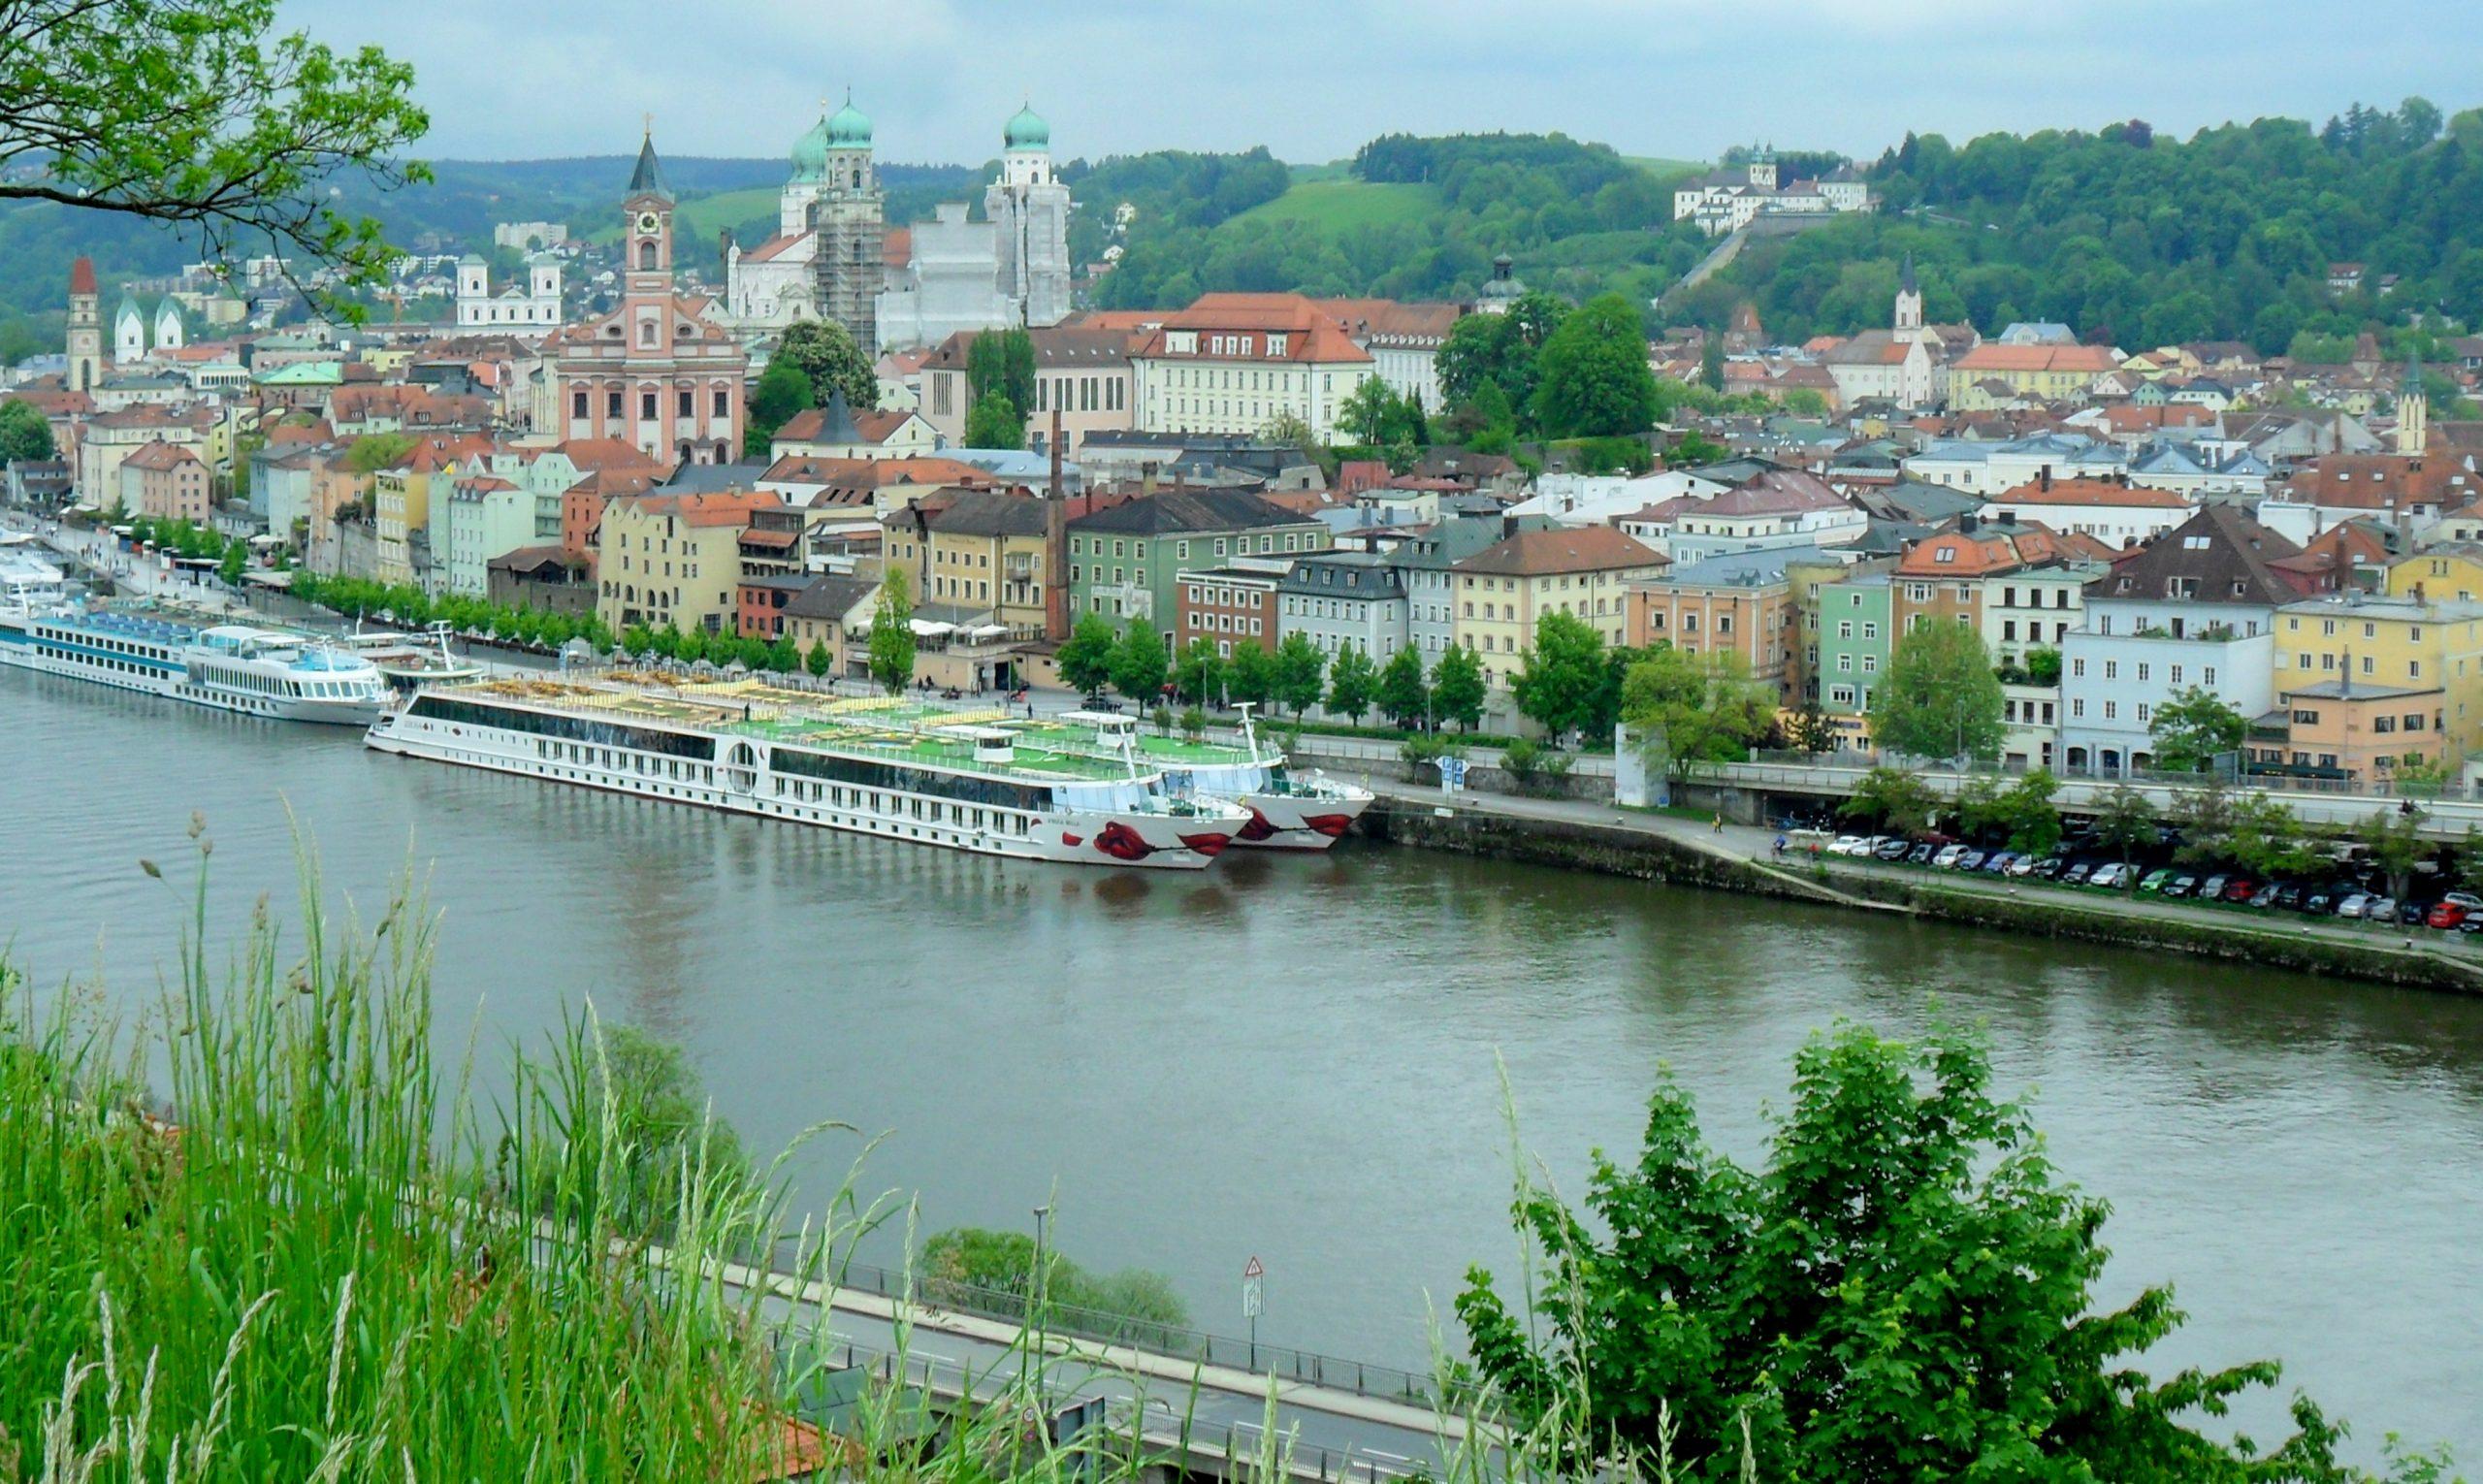 River near the city